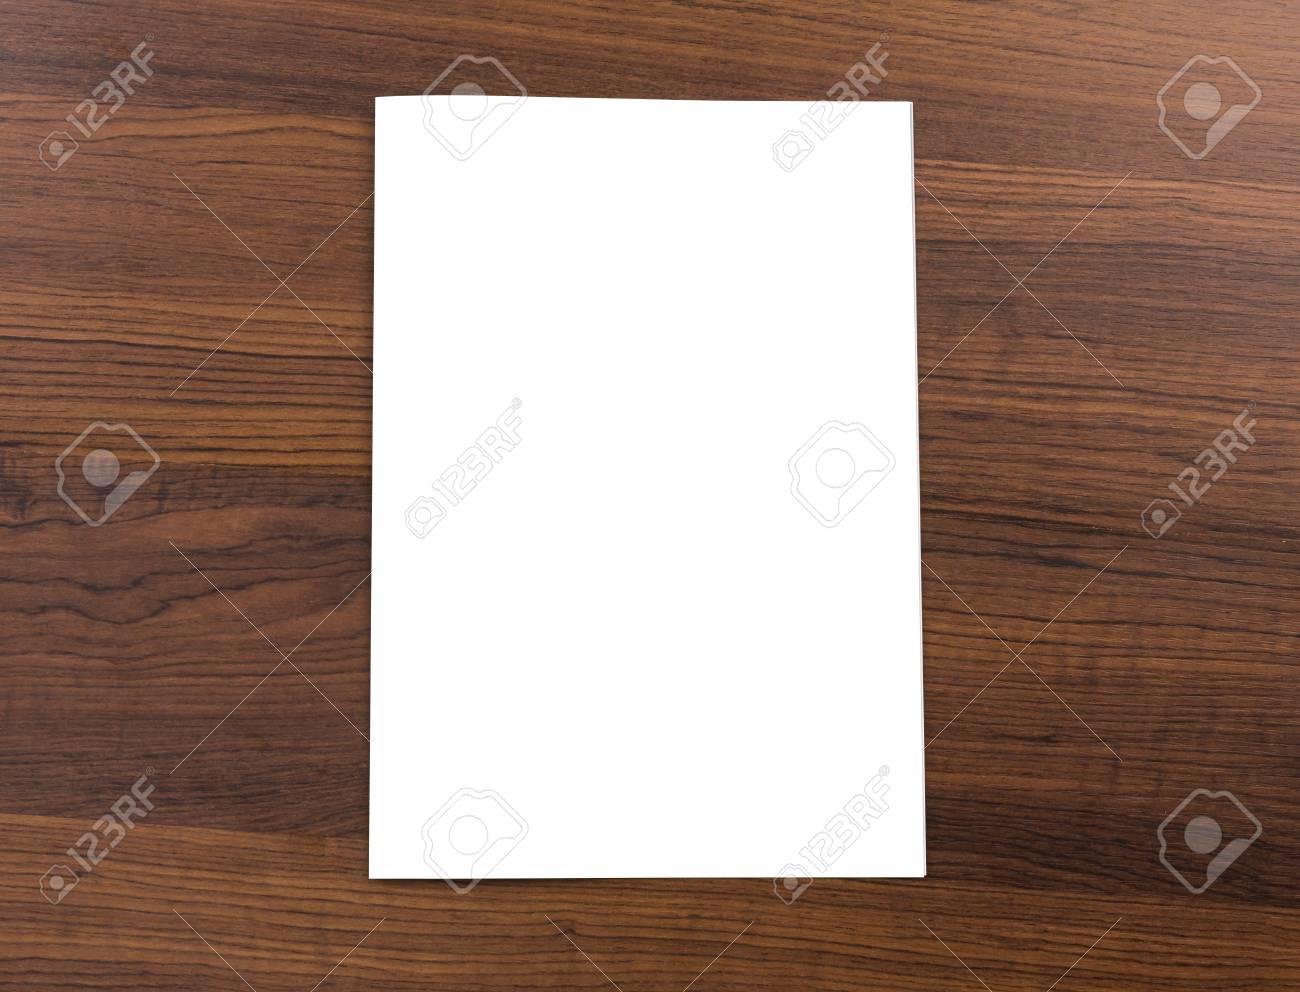 Blank catalog,brochure, mock up on wood background - 36193234